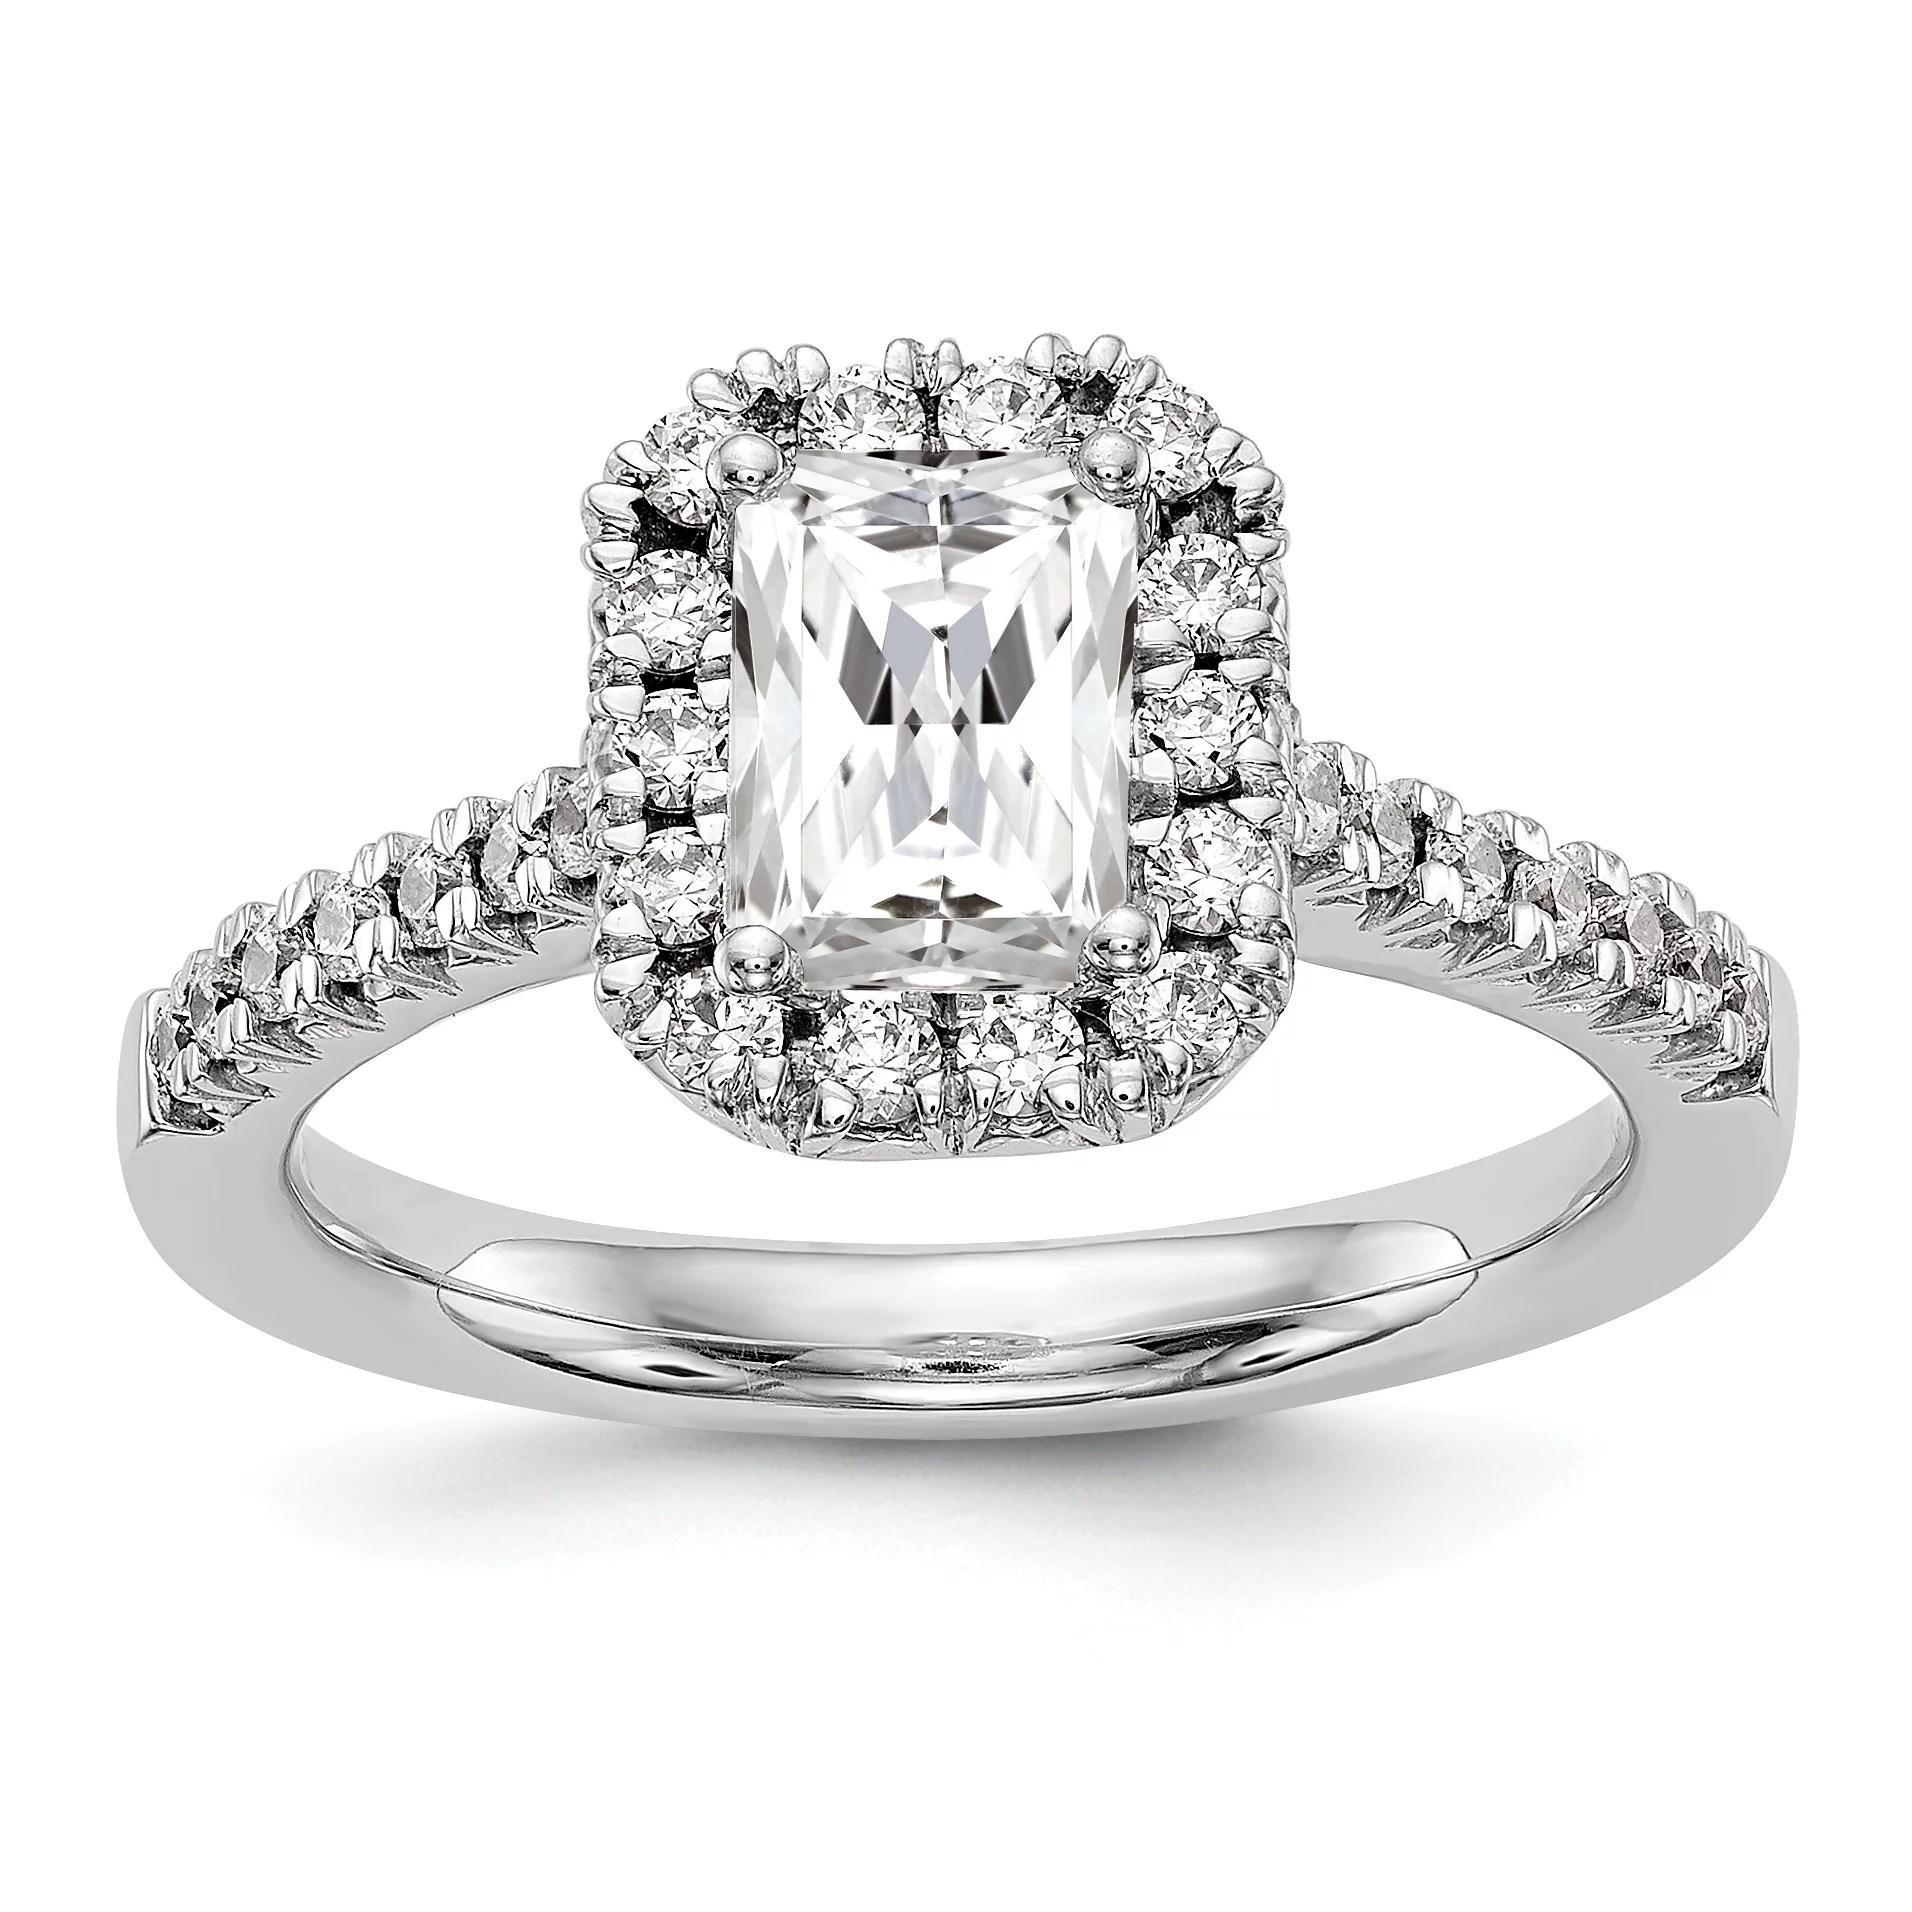 14kt White Gold True Origin Lab Grown Diamond VS/SI, D E F, S/M Emerald Halo Engagement Ring 0.28 Carat, Ring Size 7